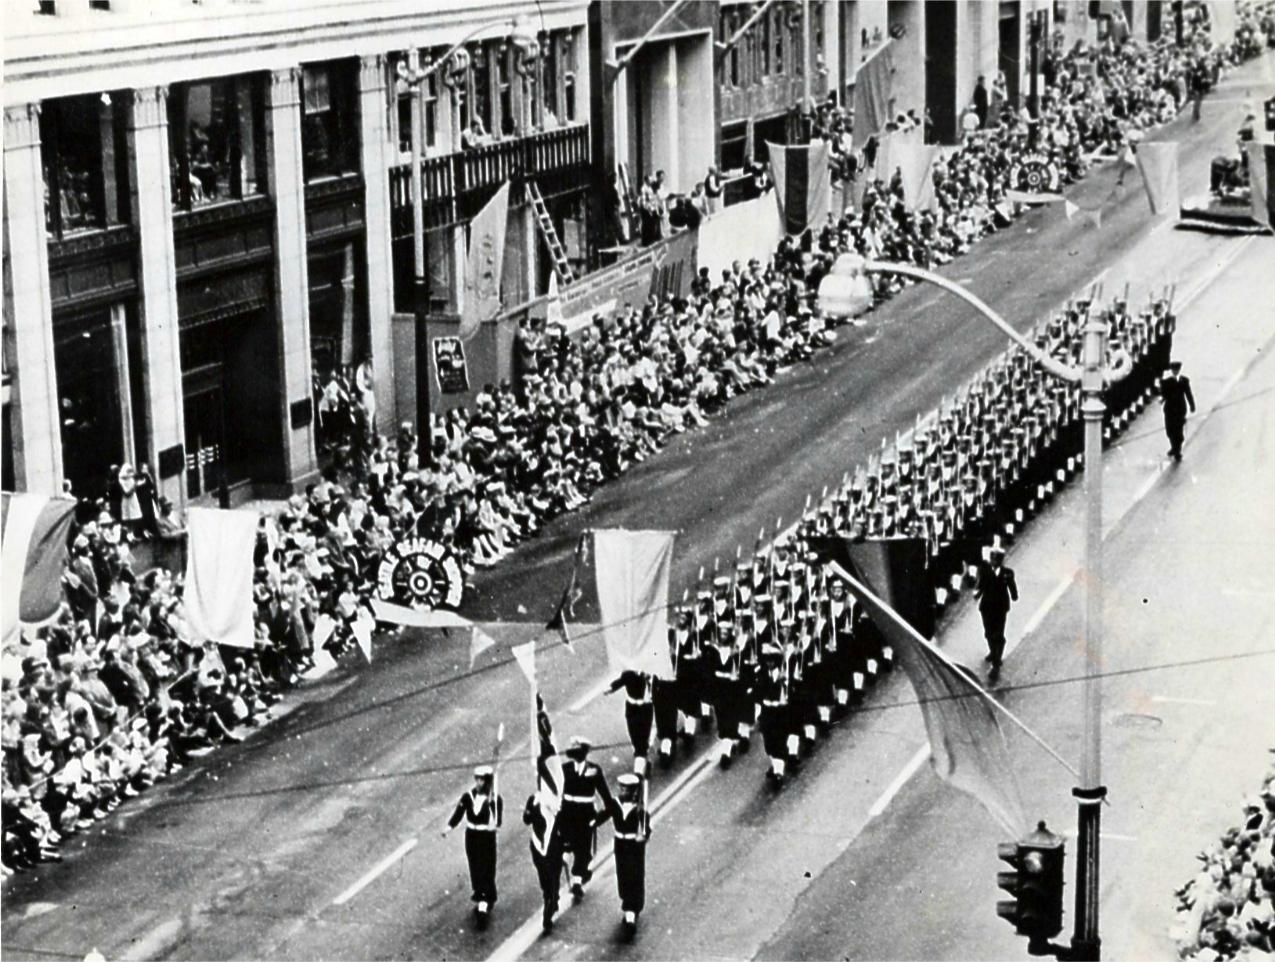 March Past in Santos